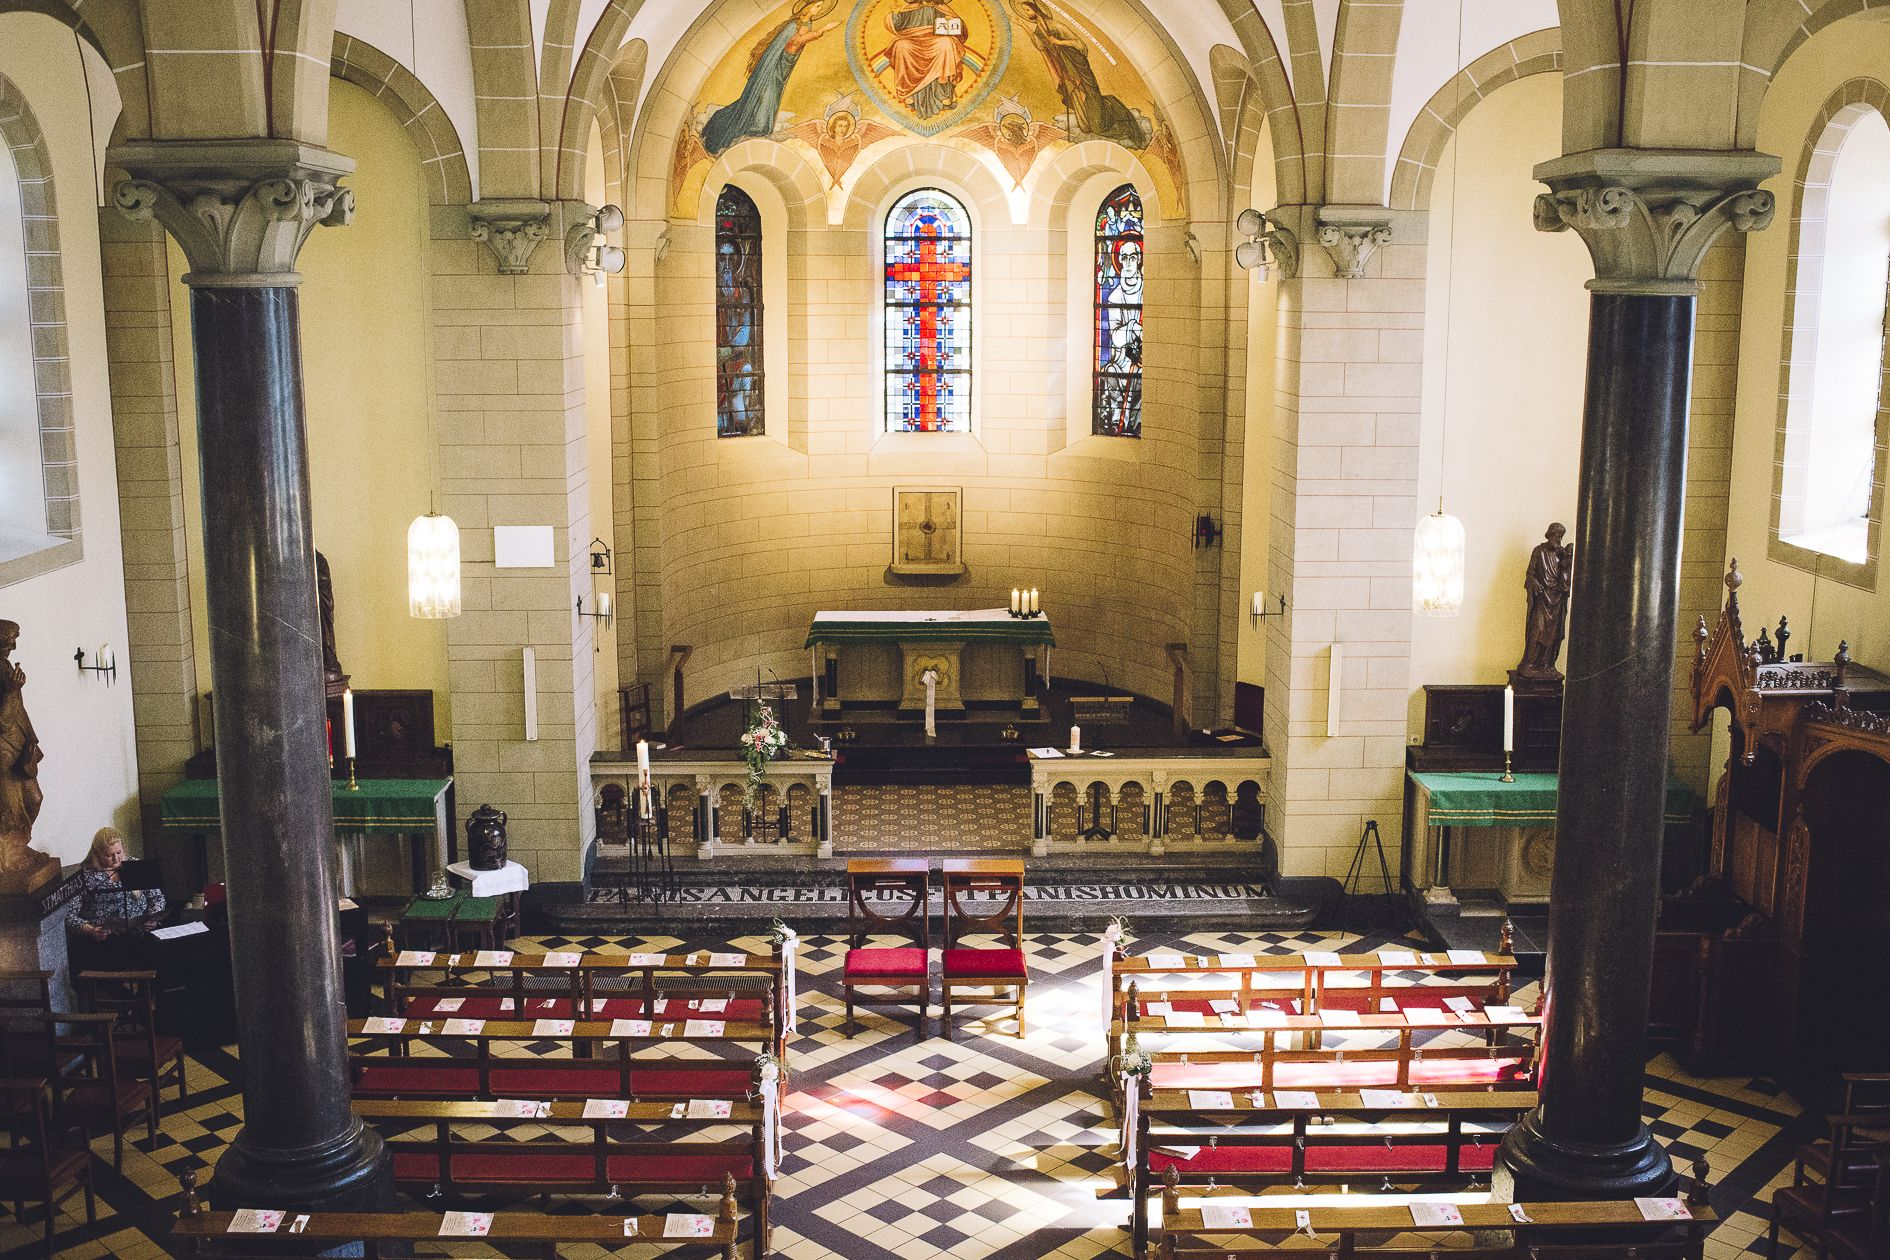 Kirche Kohlscheid St Berensberg Aachen Trauung Http Www Einblick Liebe De Kirchen Trauung Standesamt